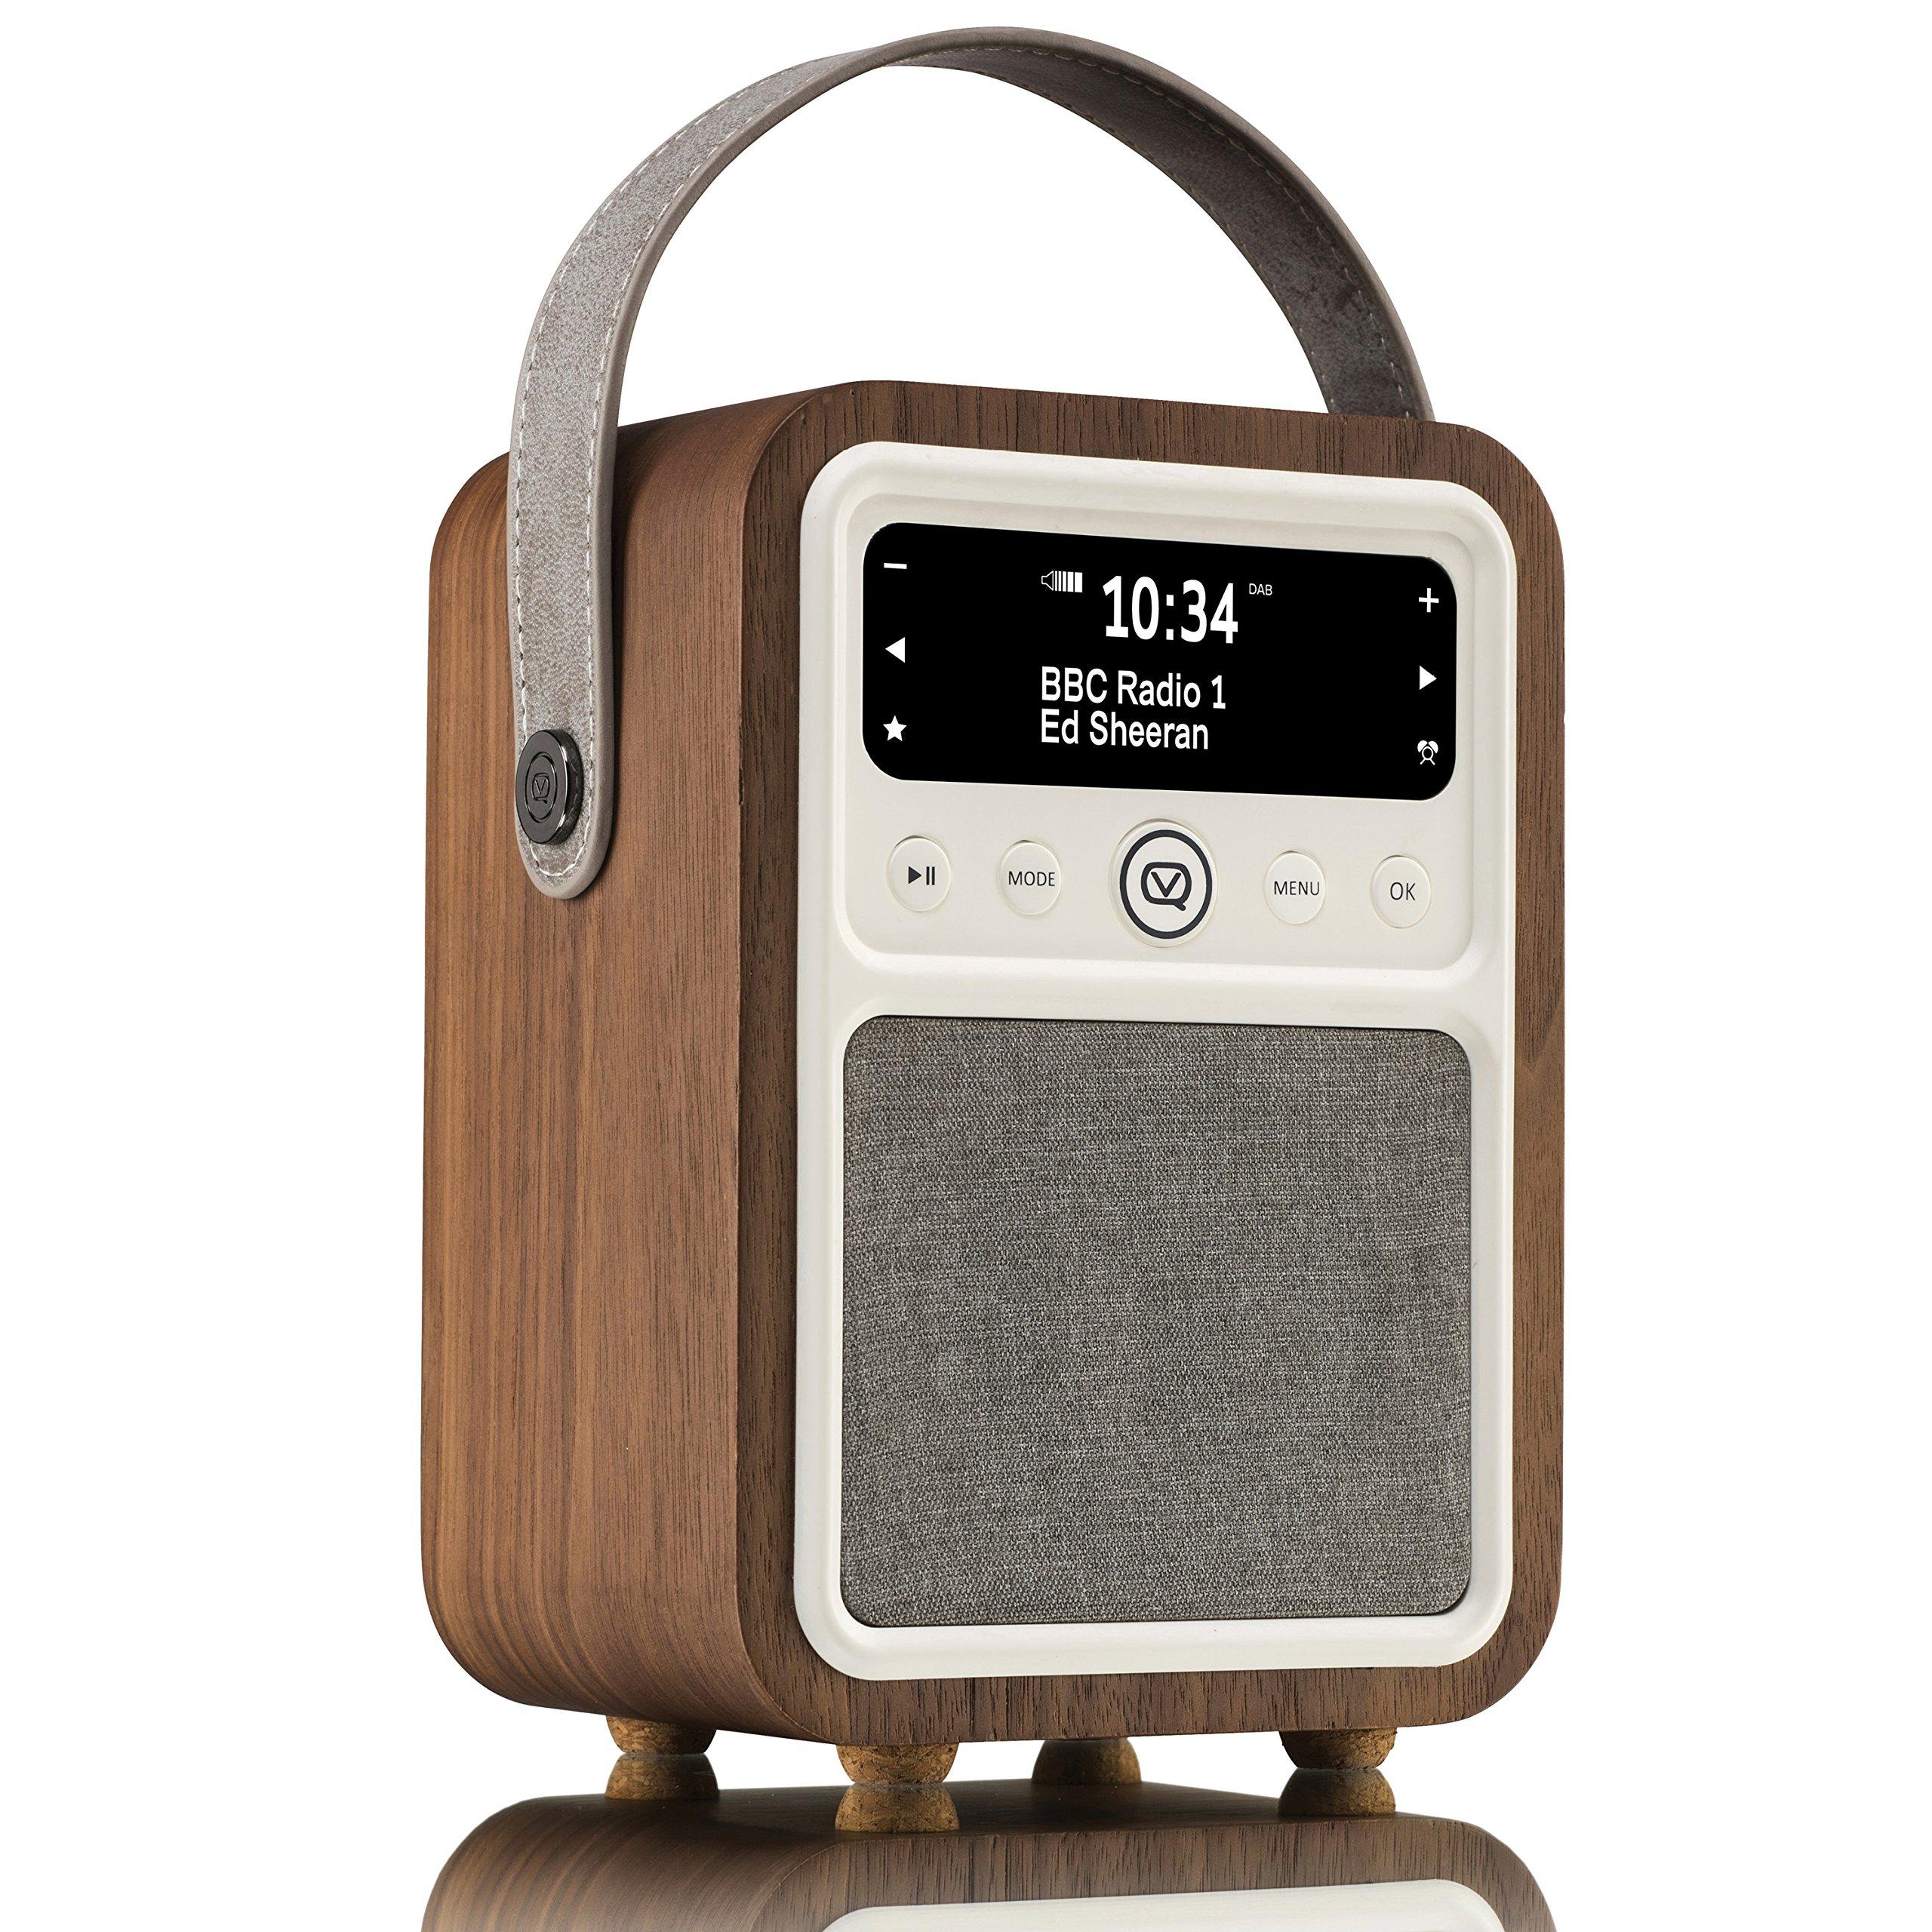 Monty by VQ | Radio & Bluetooth Speaker with AM/FM & HD Radio, Dual Alarm Clock, Mains or Battery – Real Wood Walnut Case